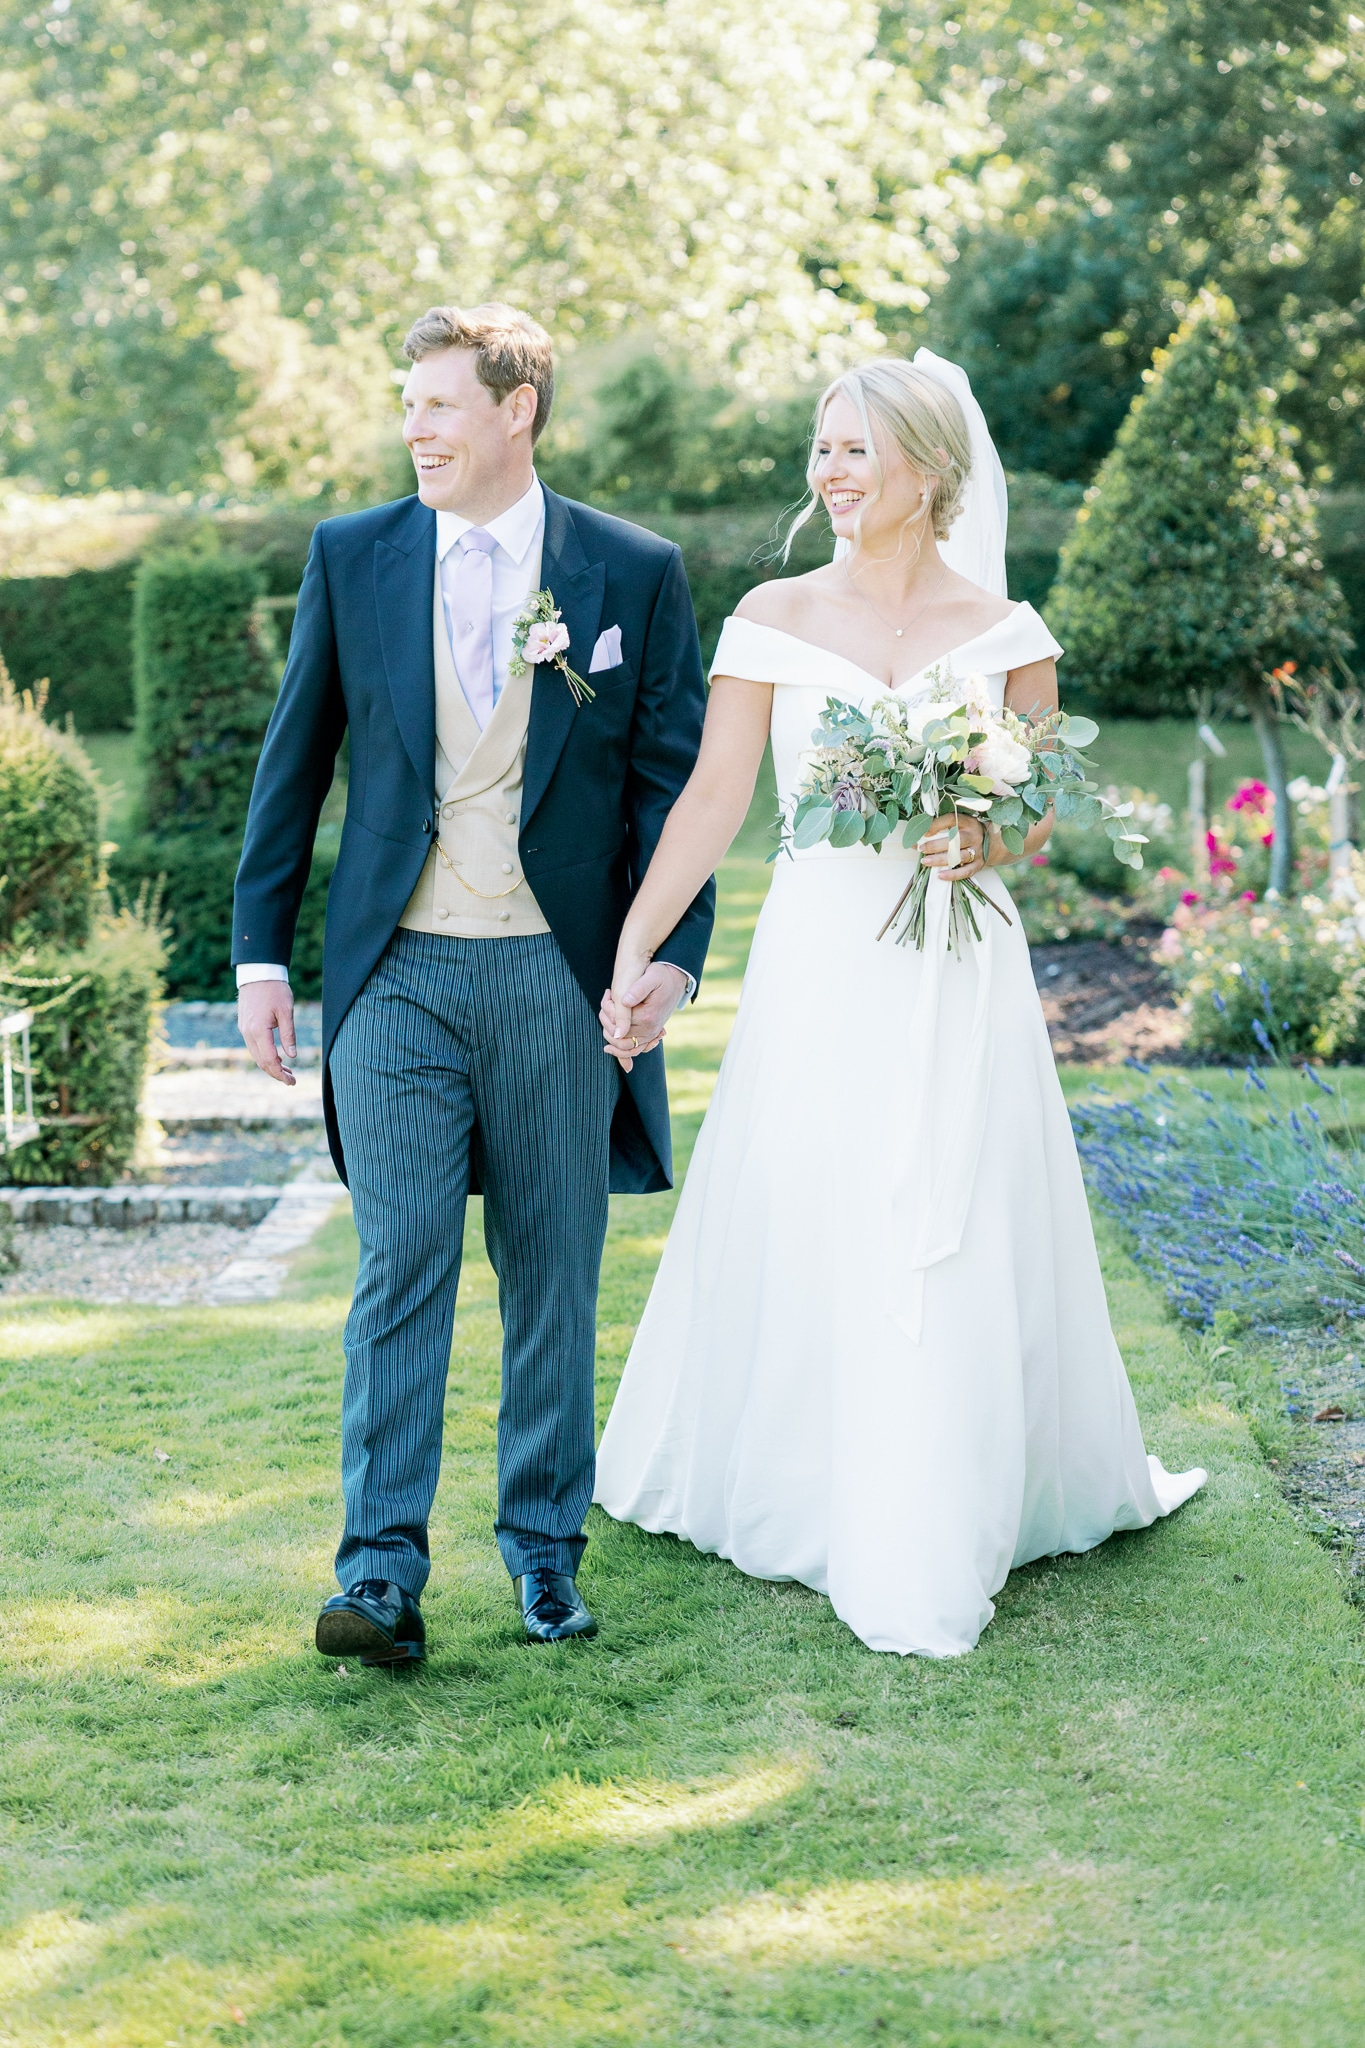 Brickwall House wedding photography near Hastings